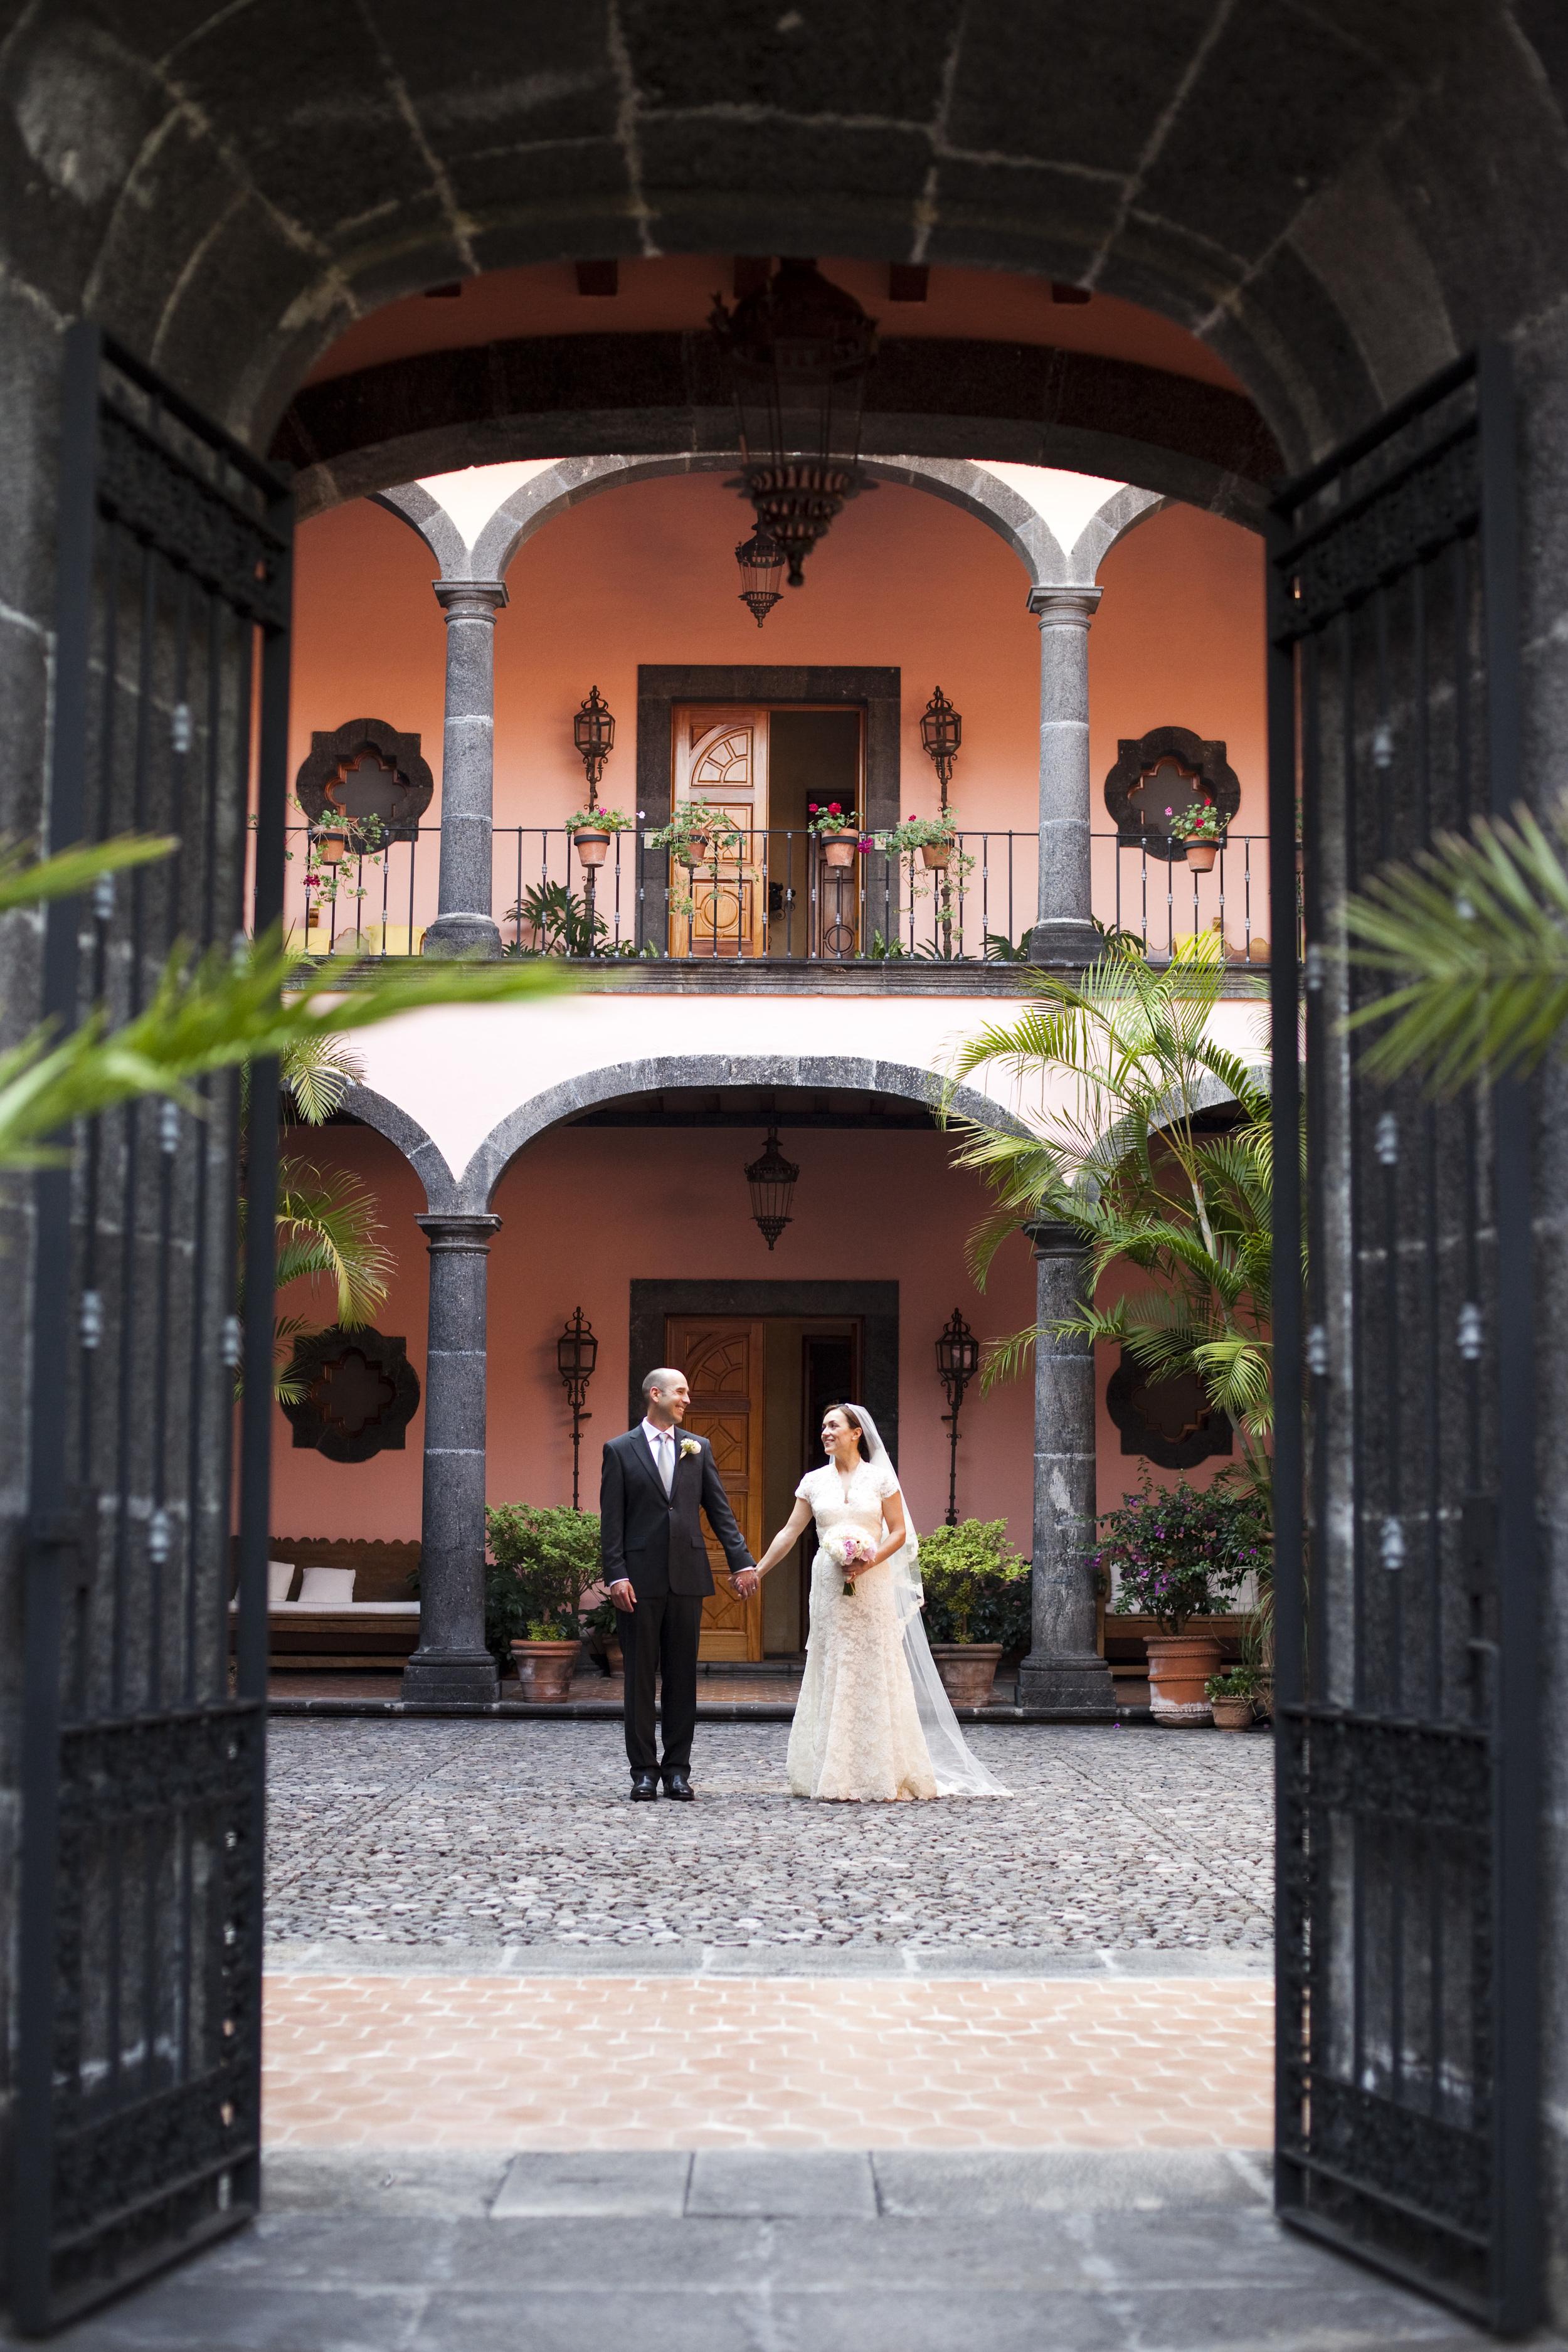 Ceci_New_York_Style_Luxury_Custom_Mexico_Wedding_CeciBride_Letterpress_NewYork_Foil_Hacienda_de_San_Antonio_35.jpg